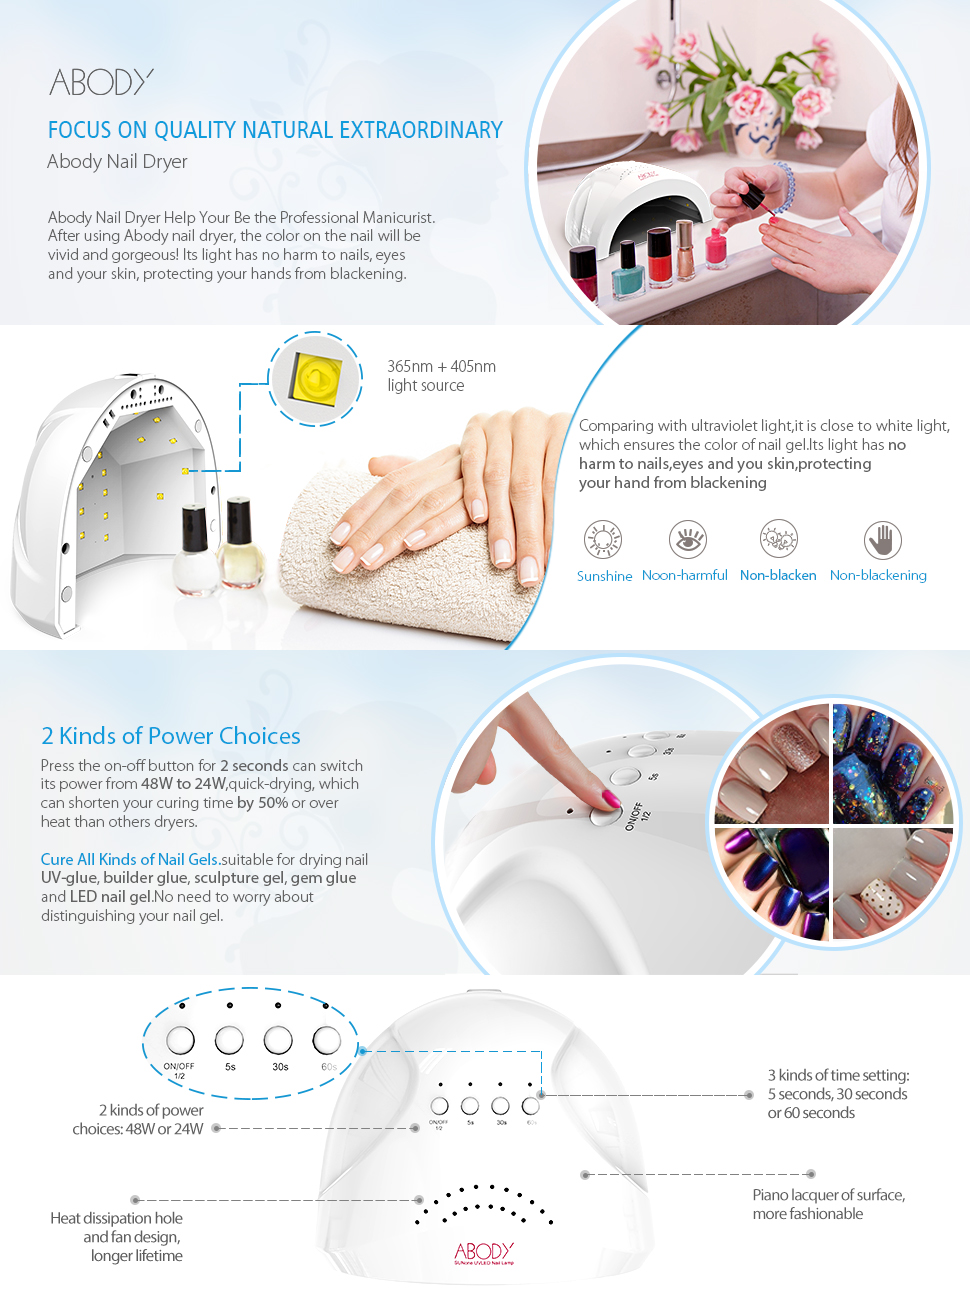 Amazon.com : Abody Nail Dryer, SUNone 48W - 24W Nail Dryer, LED UV ...